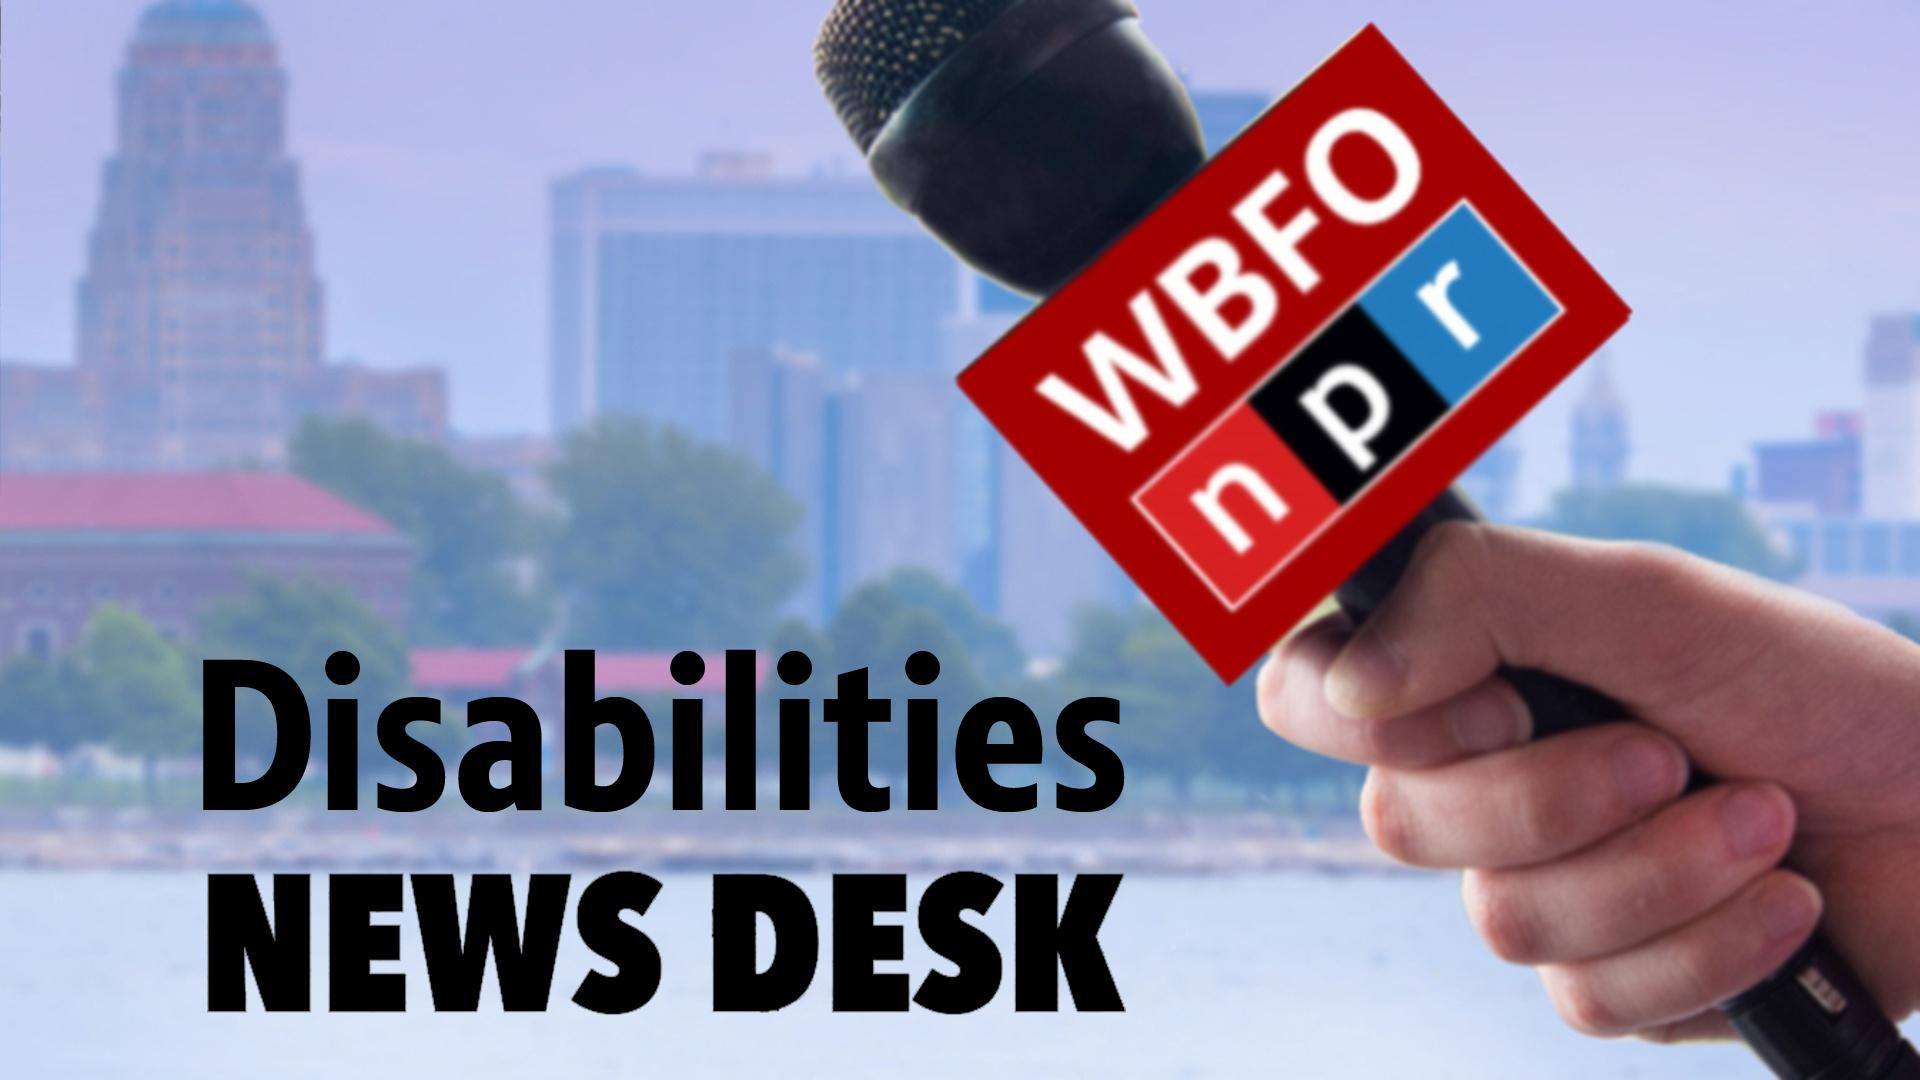 Disabilities Desk